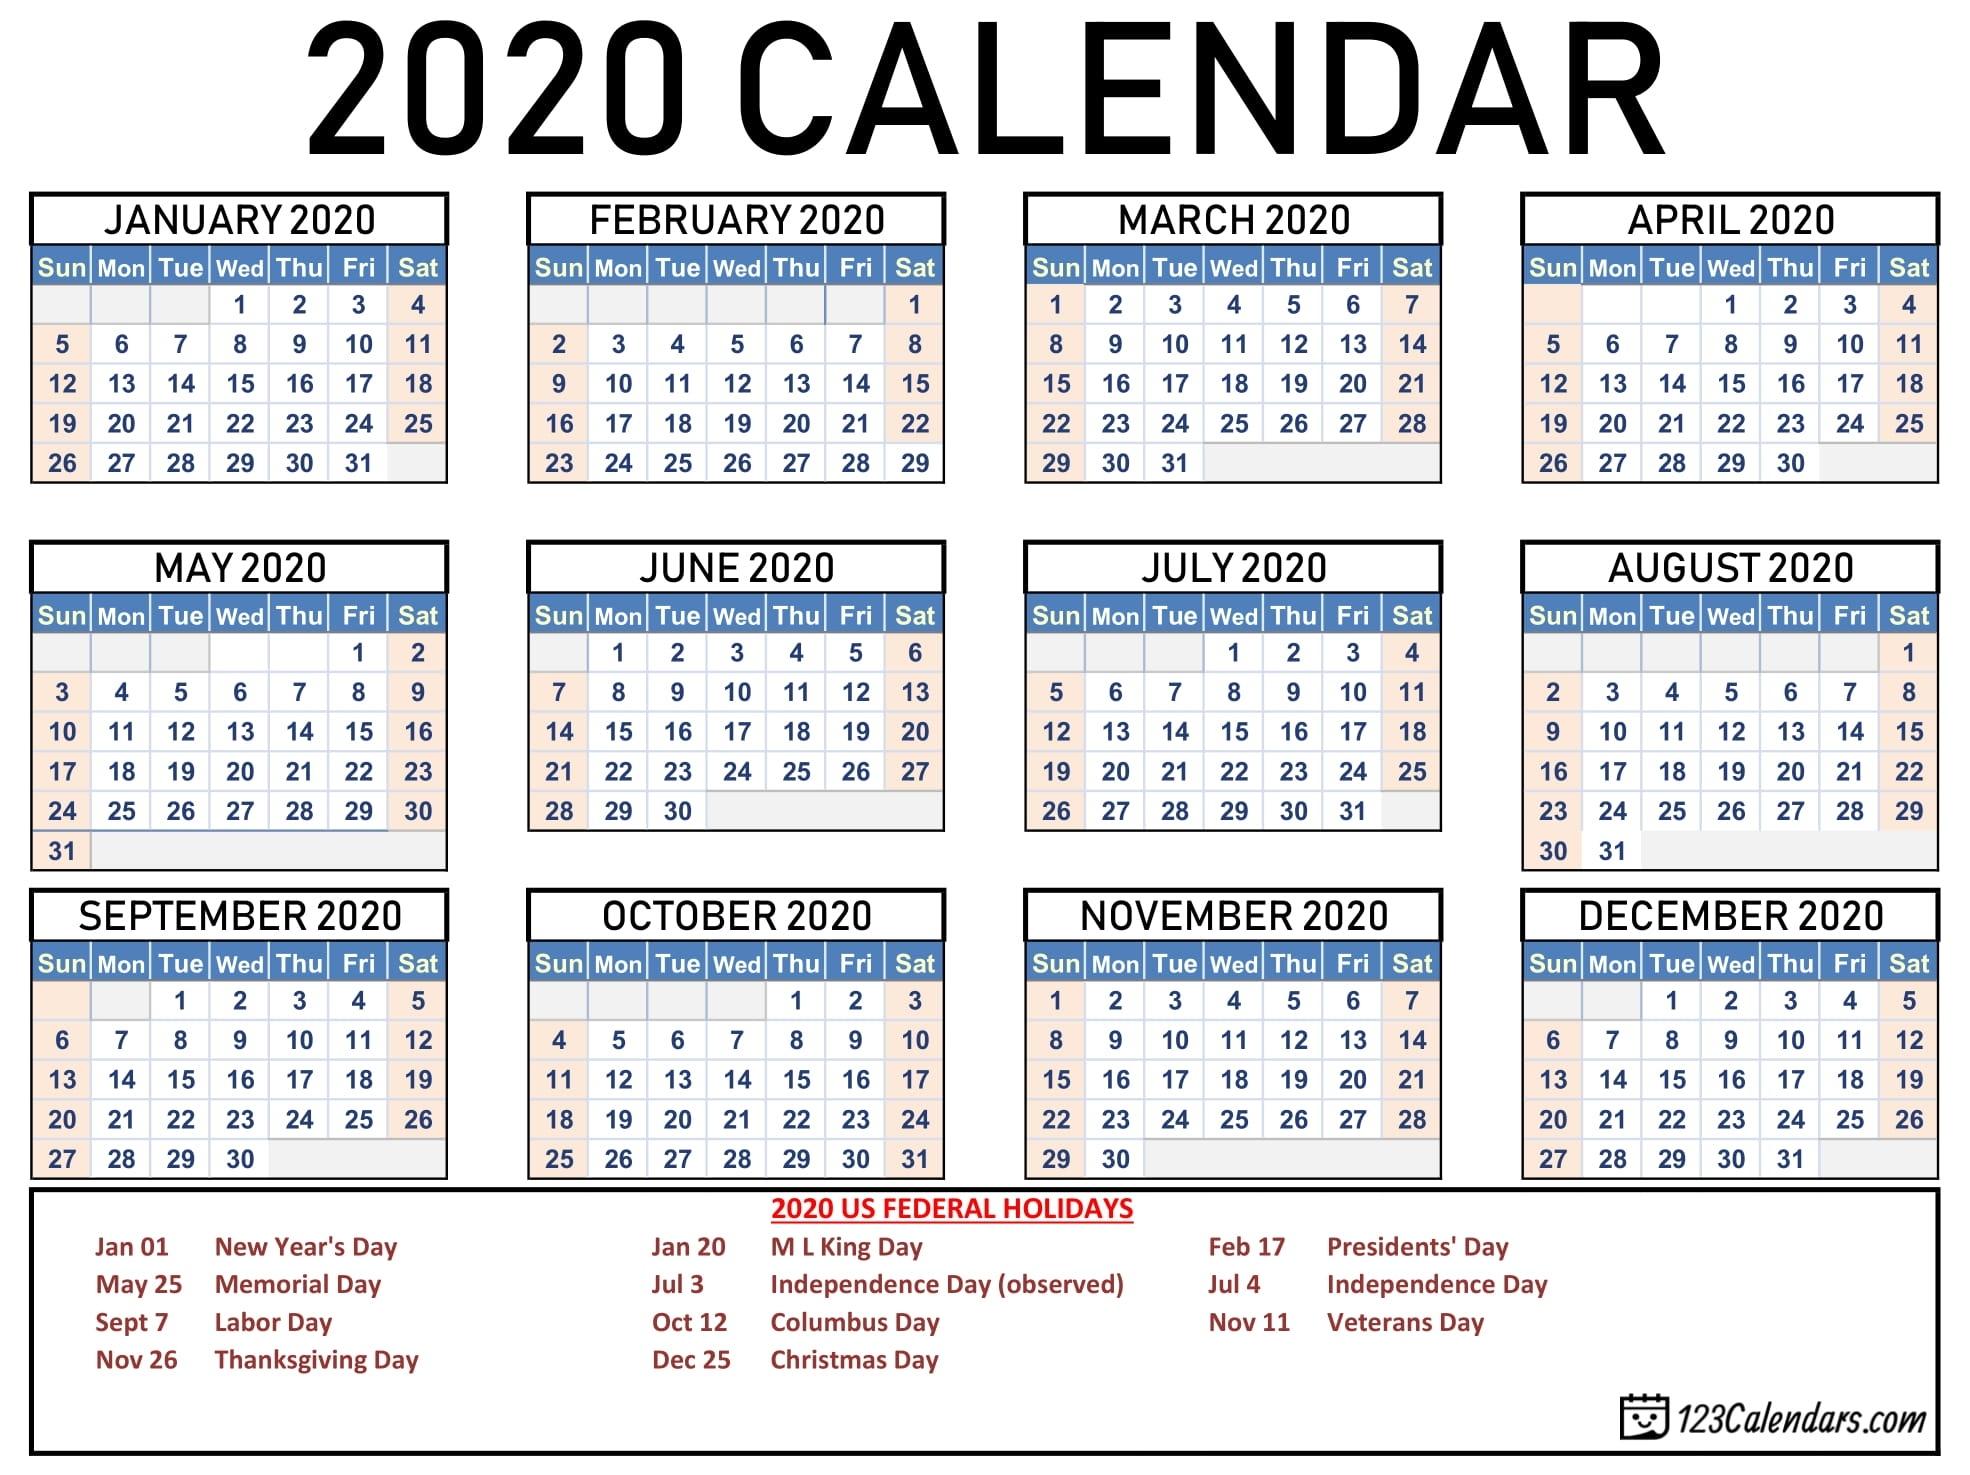 Free Printable 2020 Calendar | 123Calendars Dashing Free Printable Christmas Calendar 2020